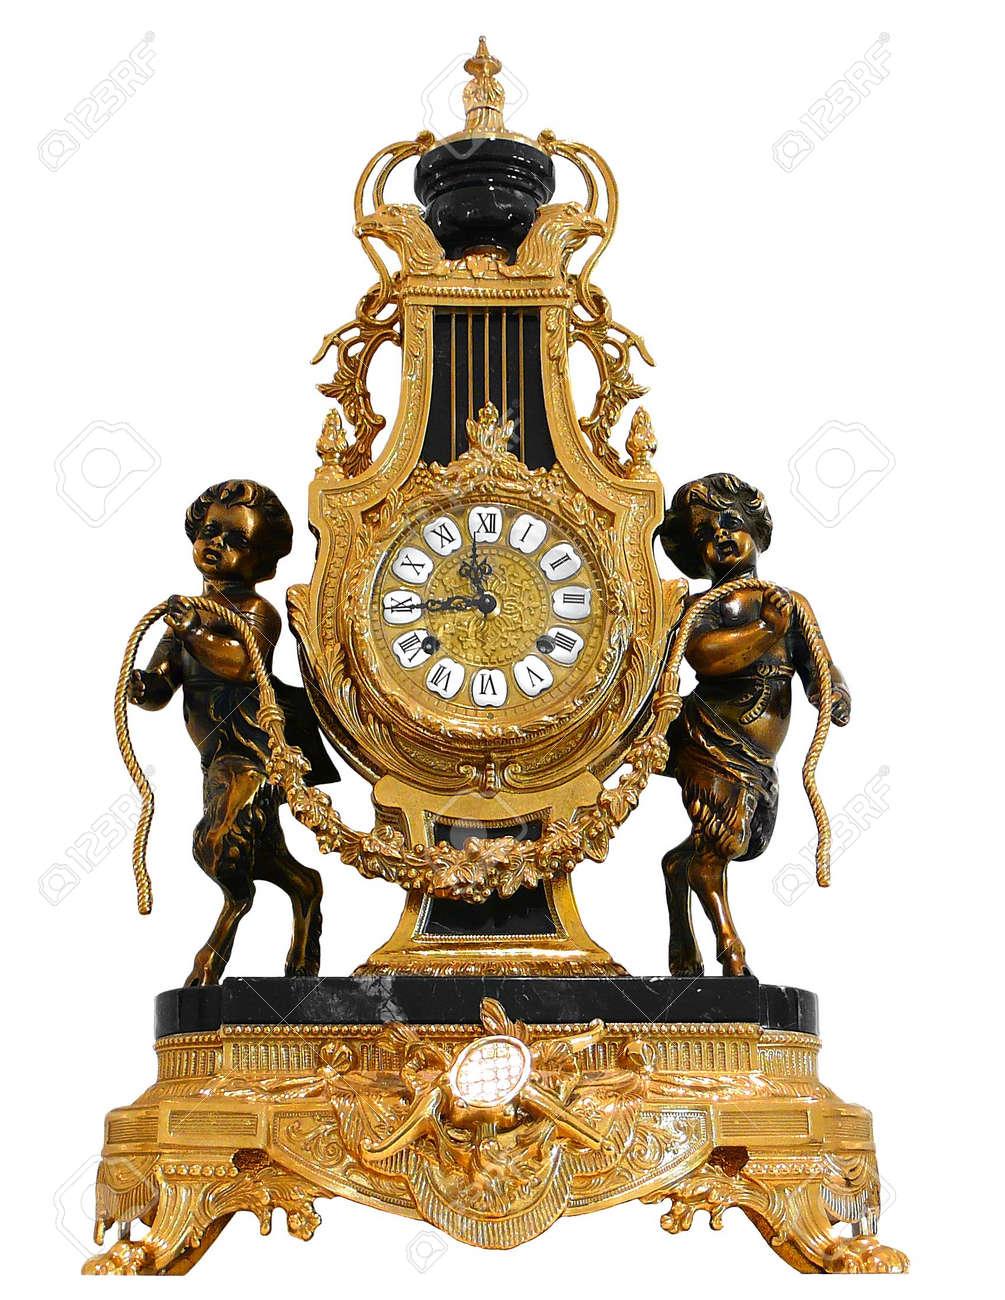 Antique Gold mantle clock Stock Photo - 5562762